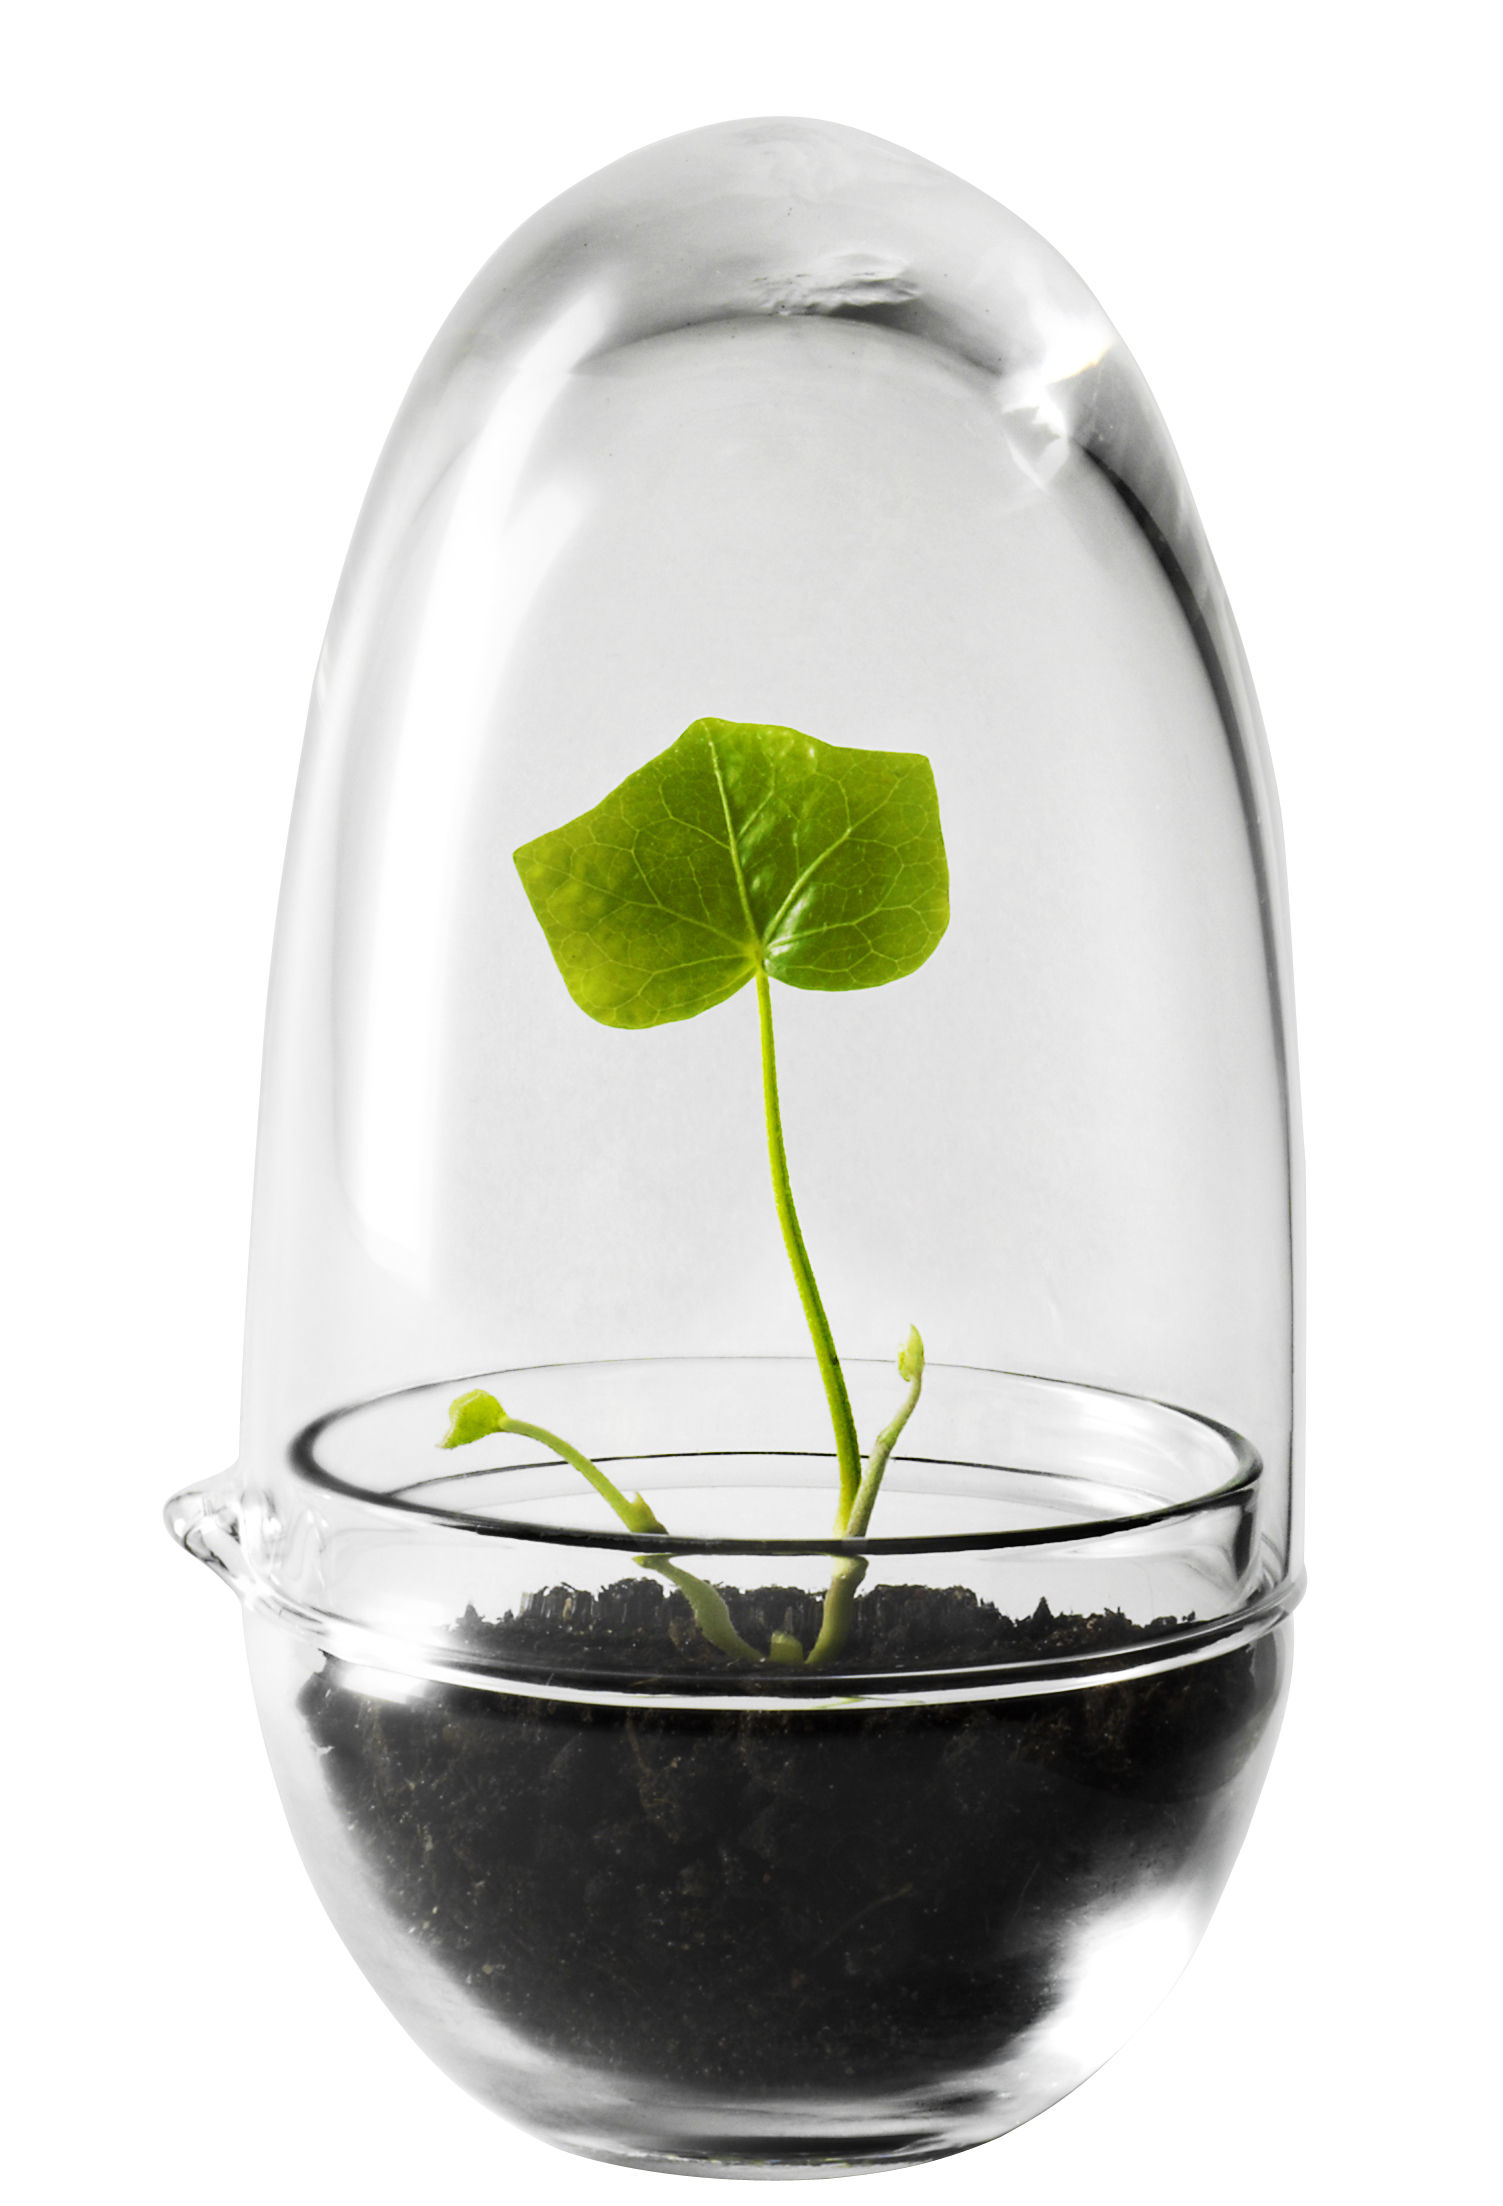 Decoration - Flower Pots & House Plants - Grow Greenhouse by Design House Stockholm - Transparent - Mouth blown glass